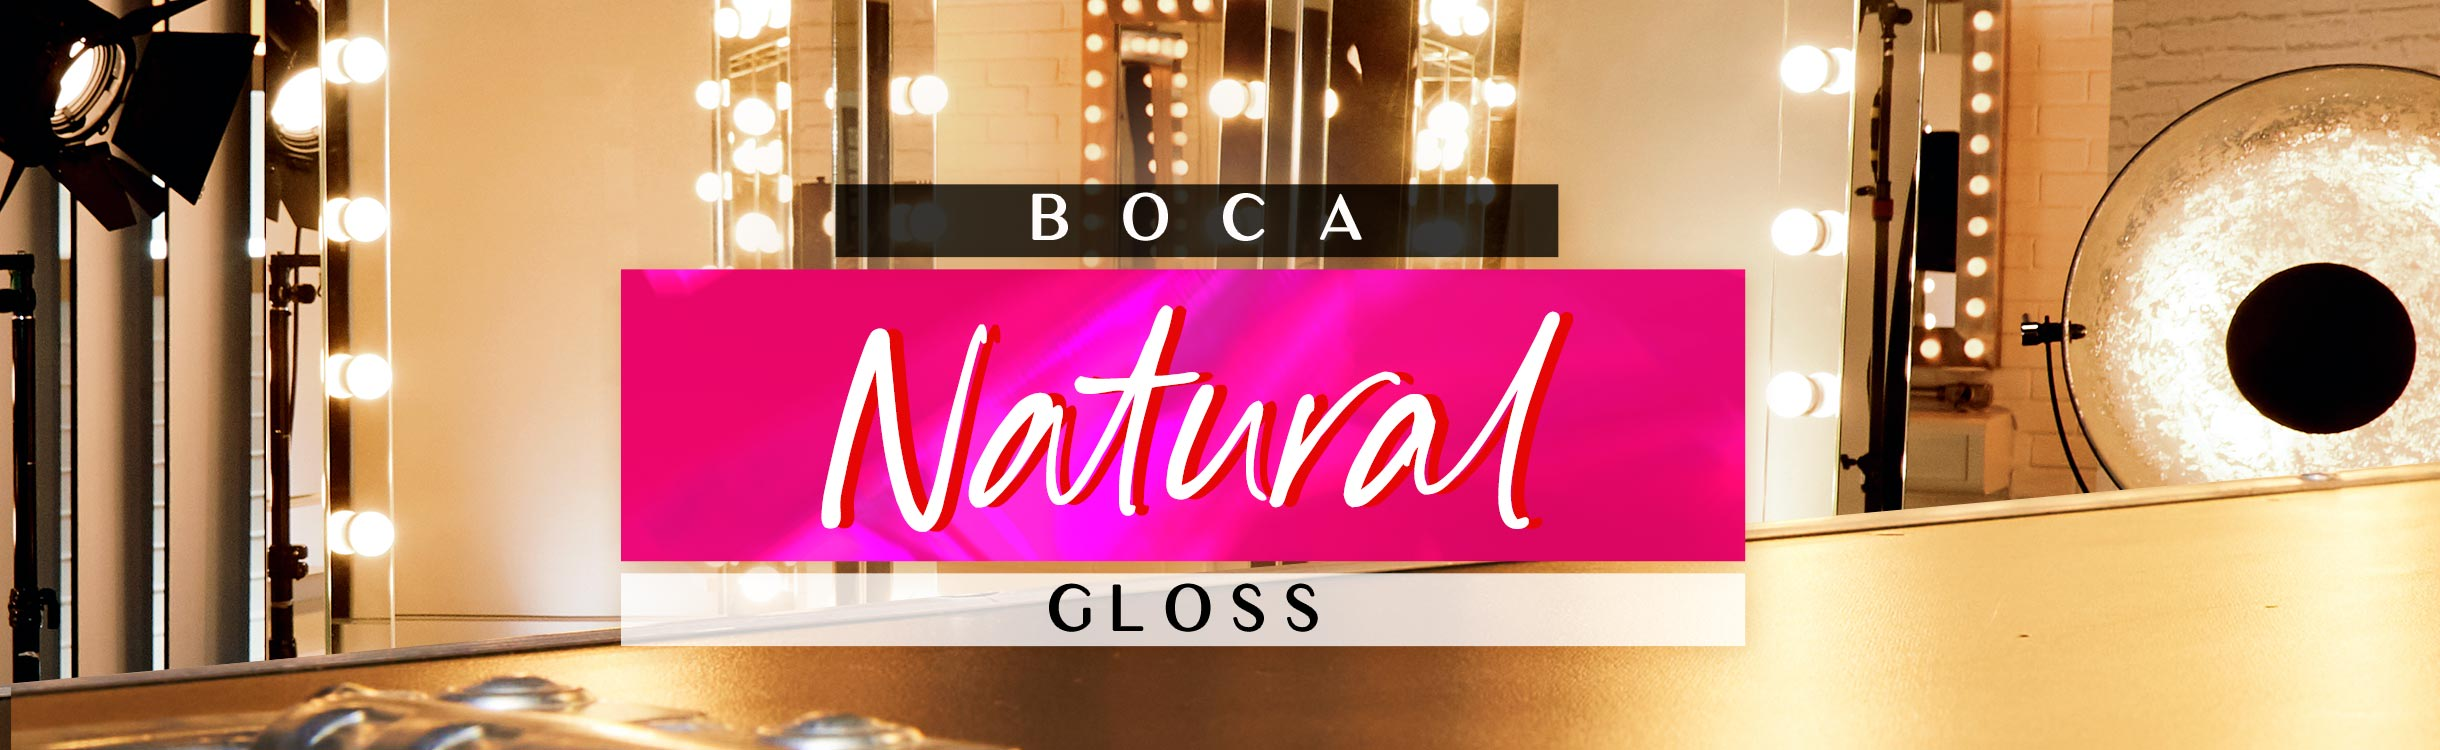 Boca Natural